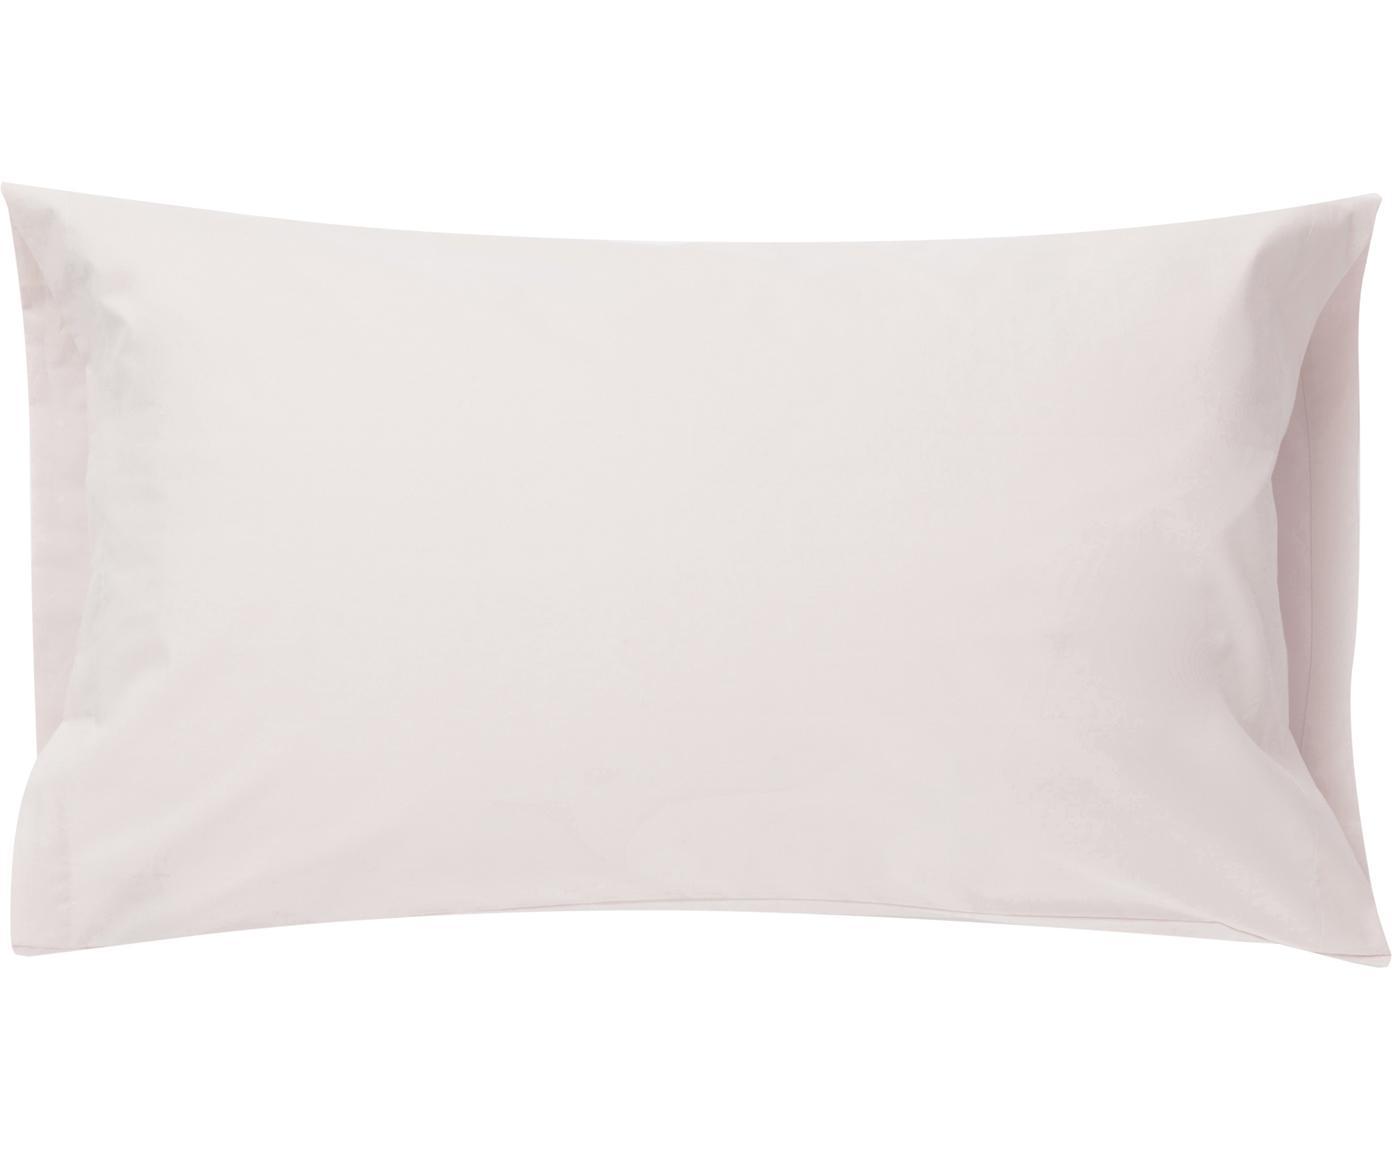 Funda de almohada Plain Dye, Algodón, Rosa, An 50 x L 110 cm